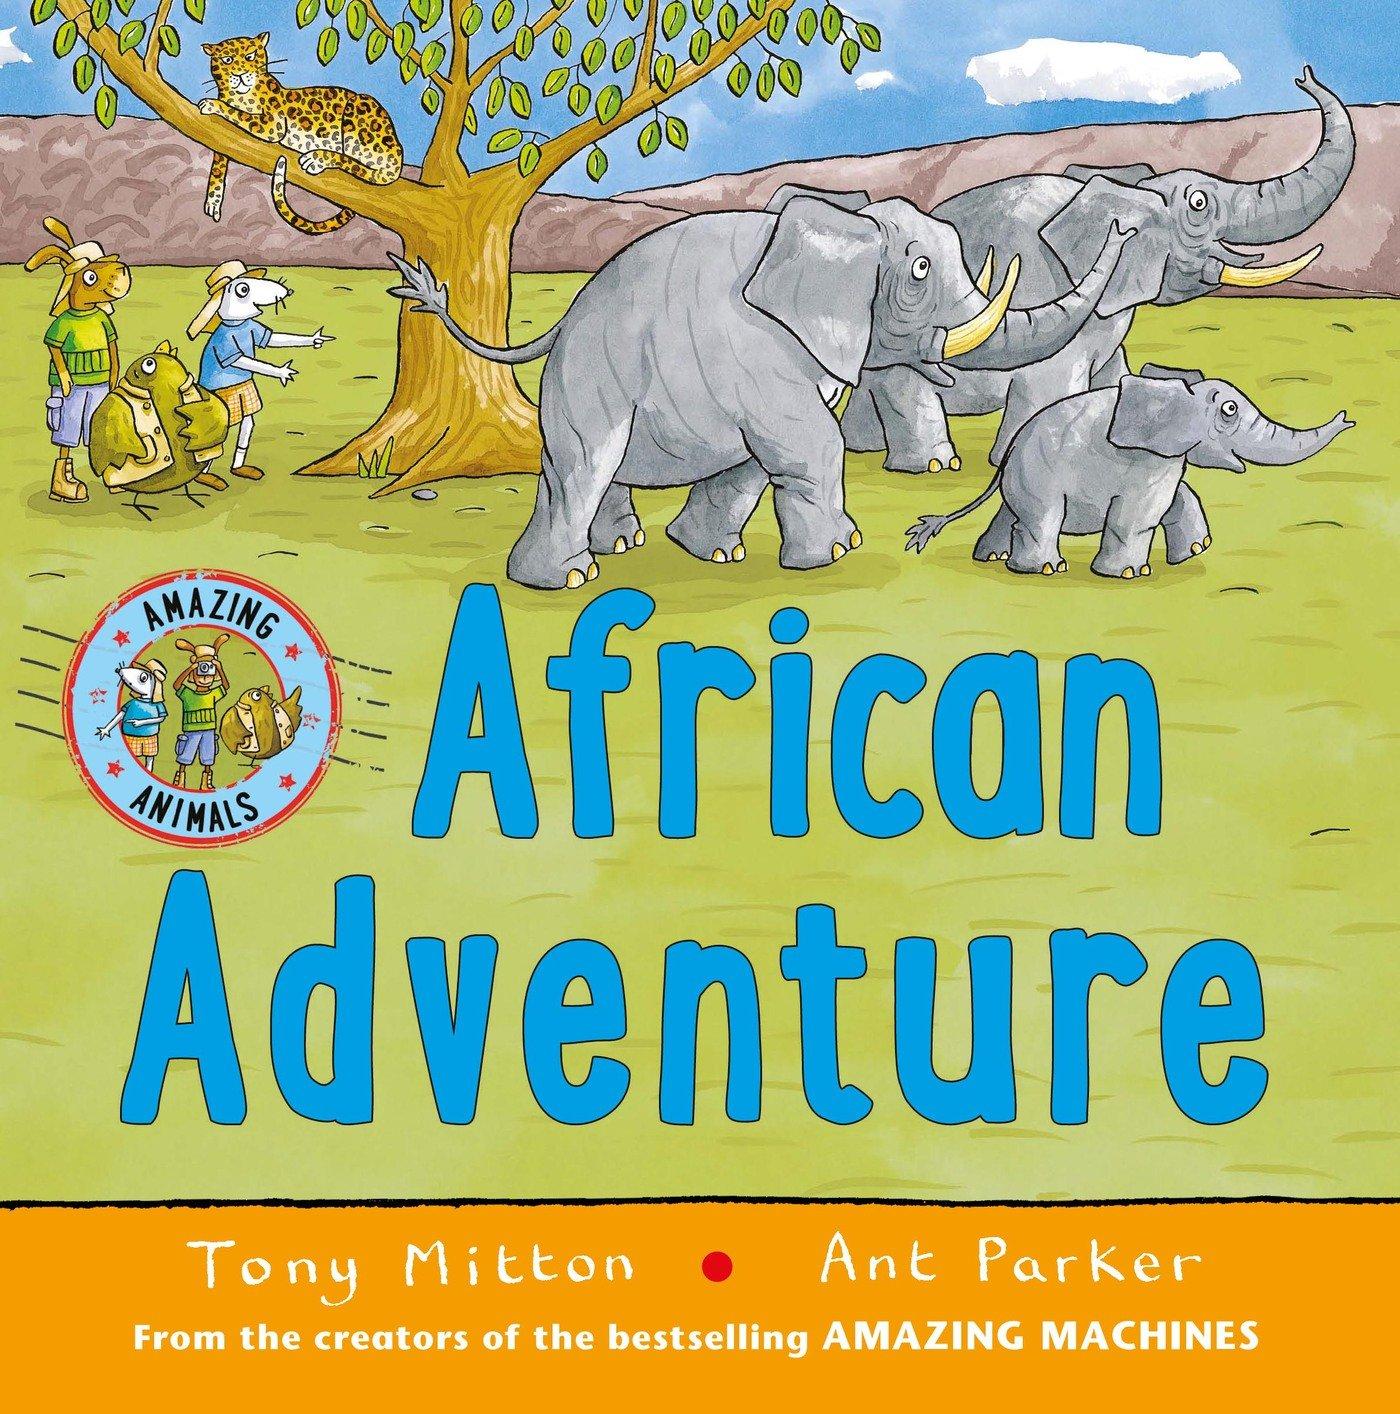 Saggy Baggy Elephant Printables Classroom Activities Teacher Resources Rif